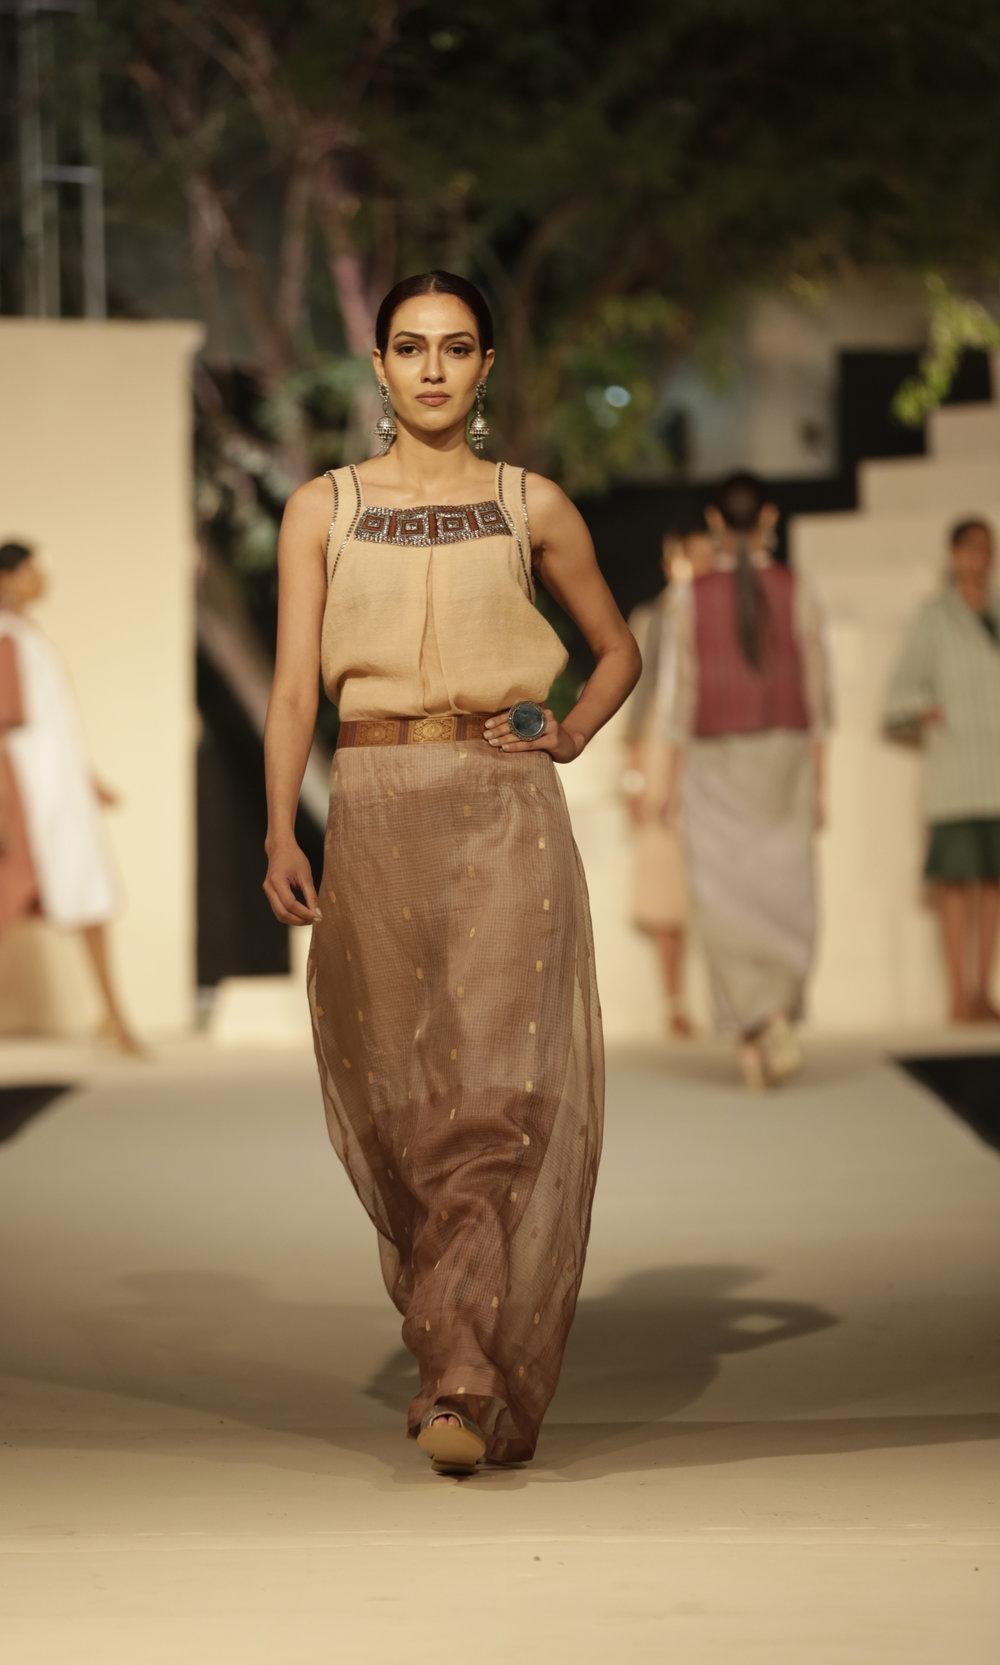 RH1101 Top   RH1102 Skirt